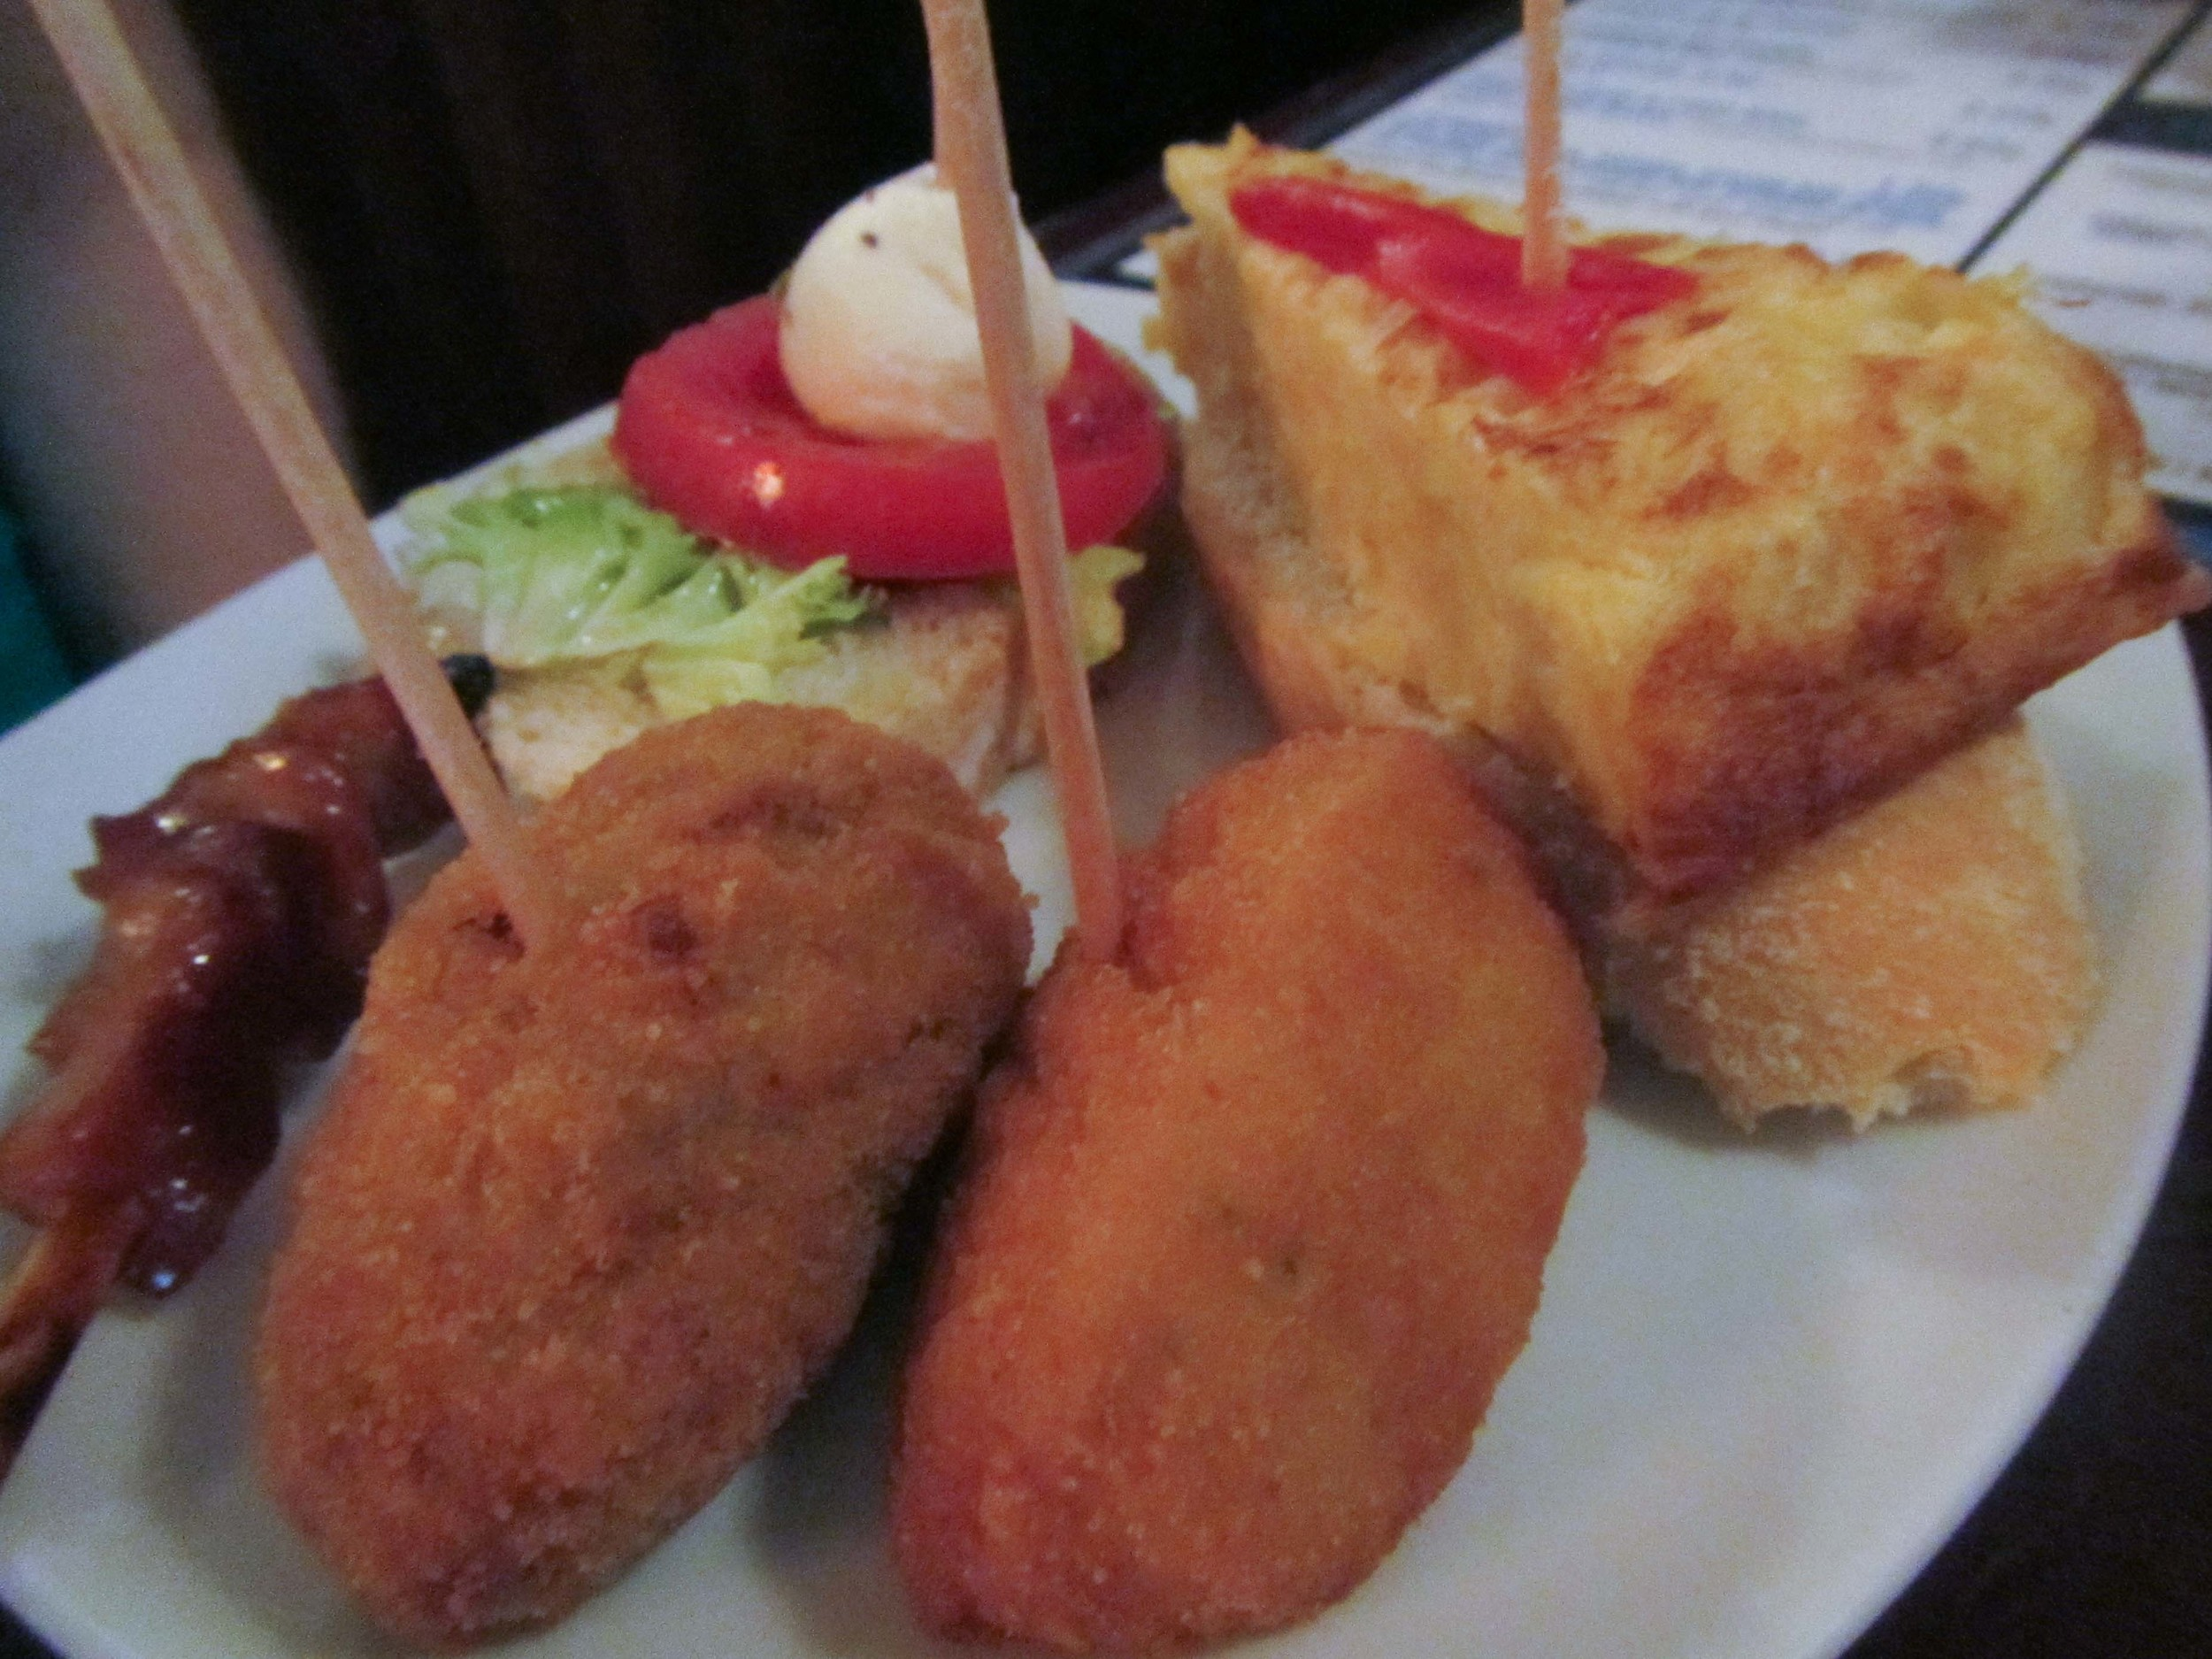 croquettes, capresse bread, potato quiche and some sort of meat on a stick